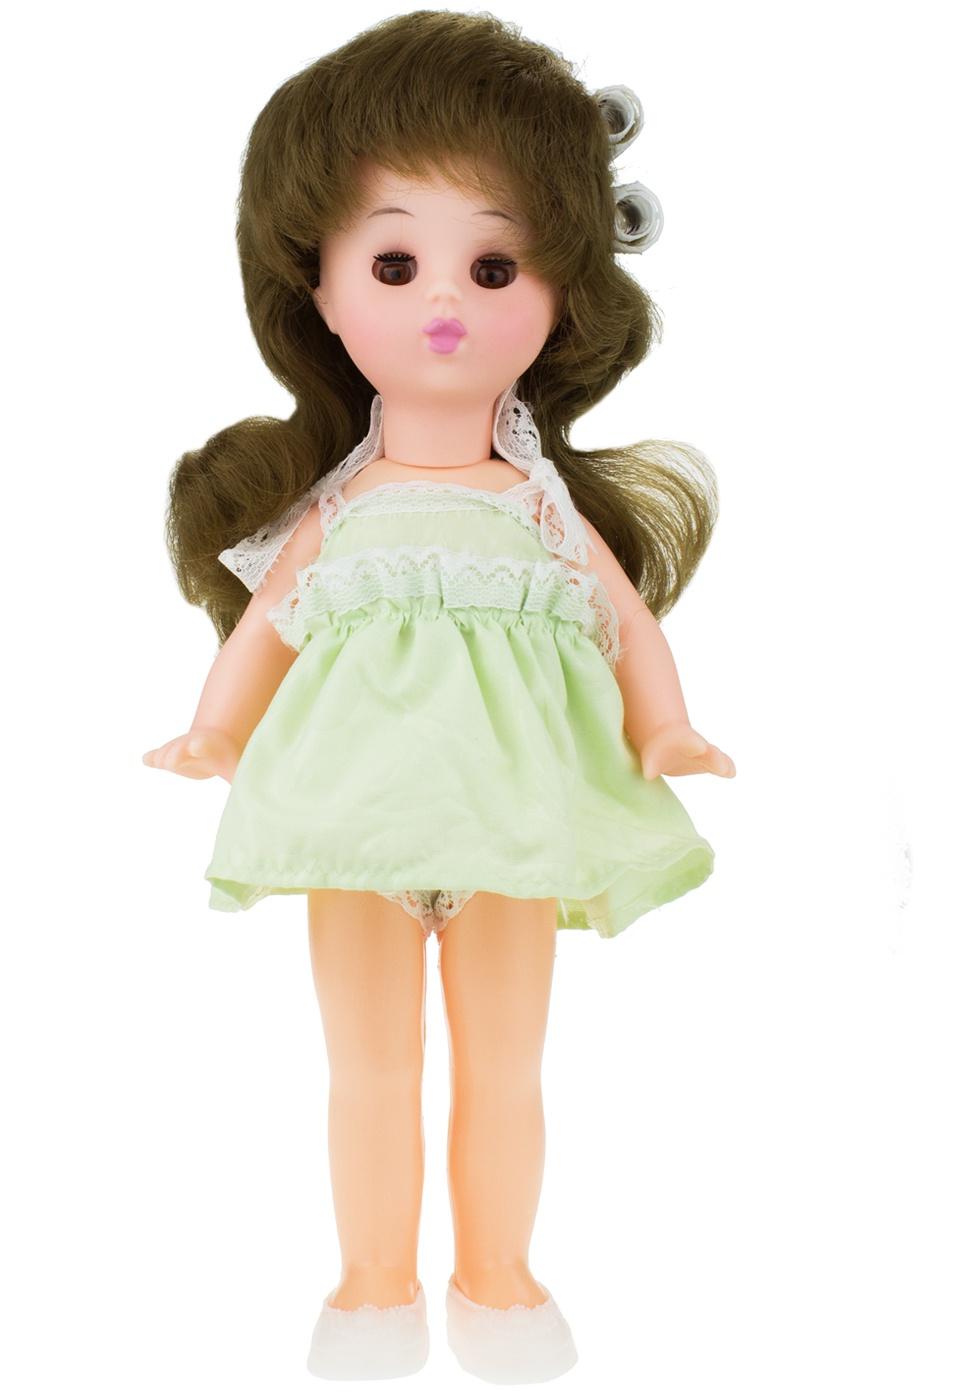 Кукла Мир кукол Мила светло-зеленый куклы мир кукол кукла ася пак 35 см